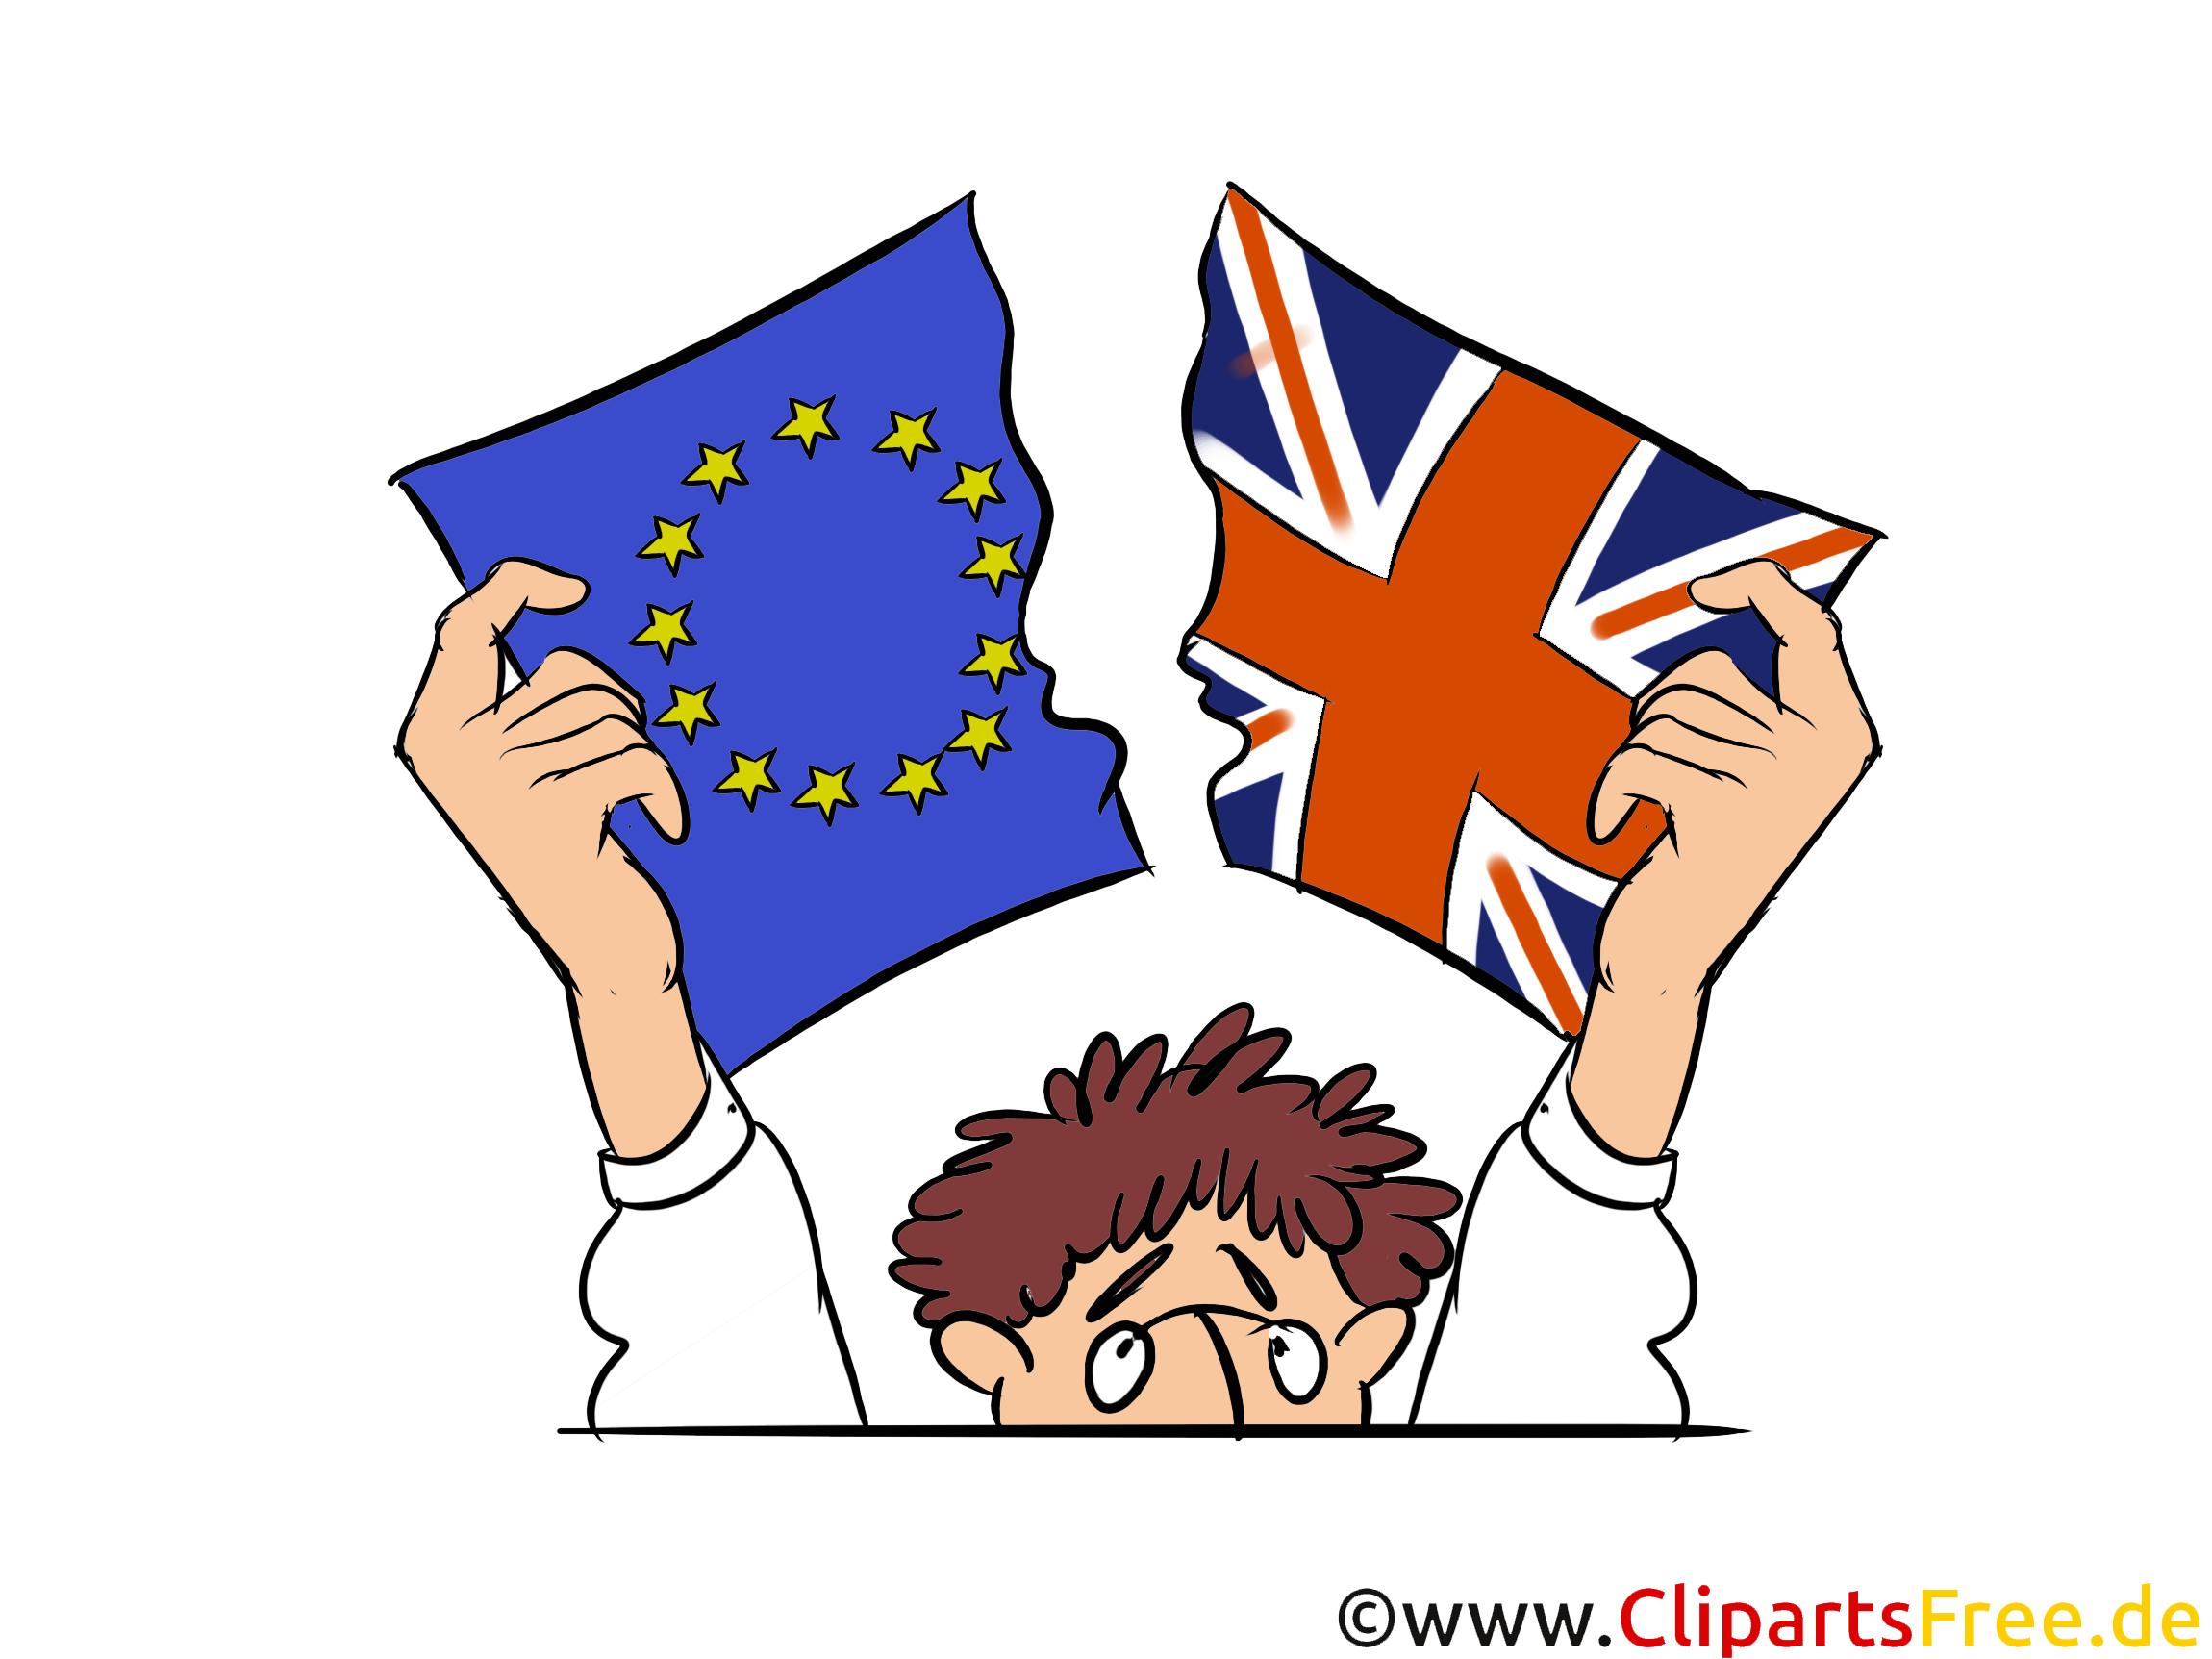 Brexit Flaggen EU UK - Bilder, Illustrationen, Clipart